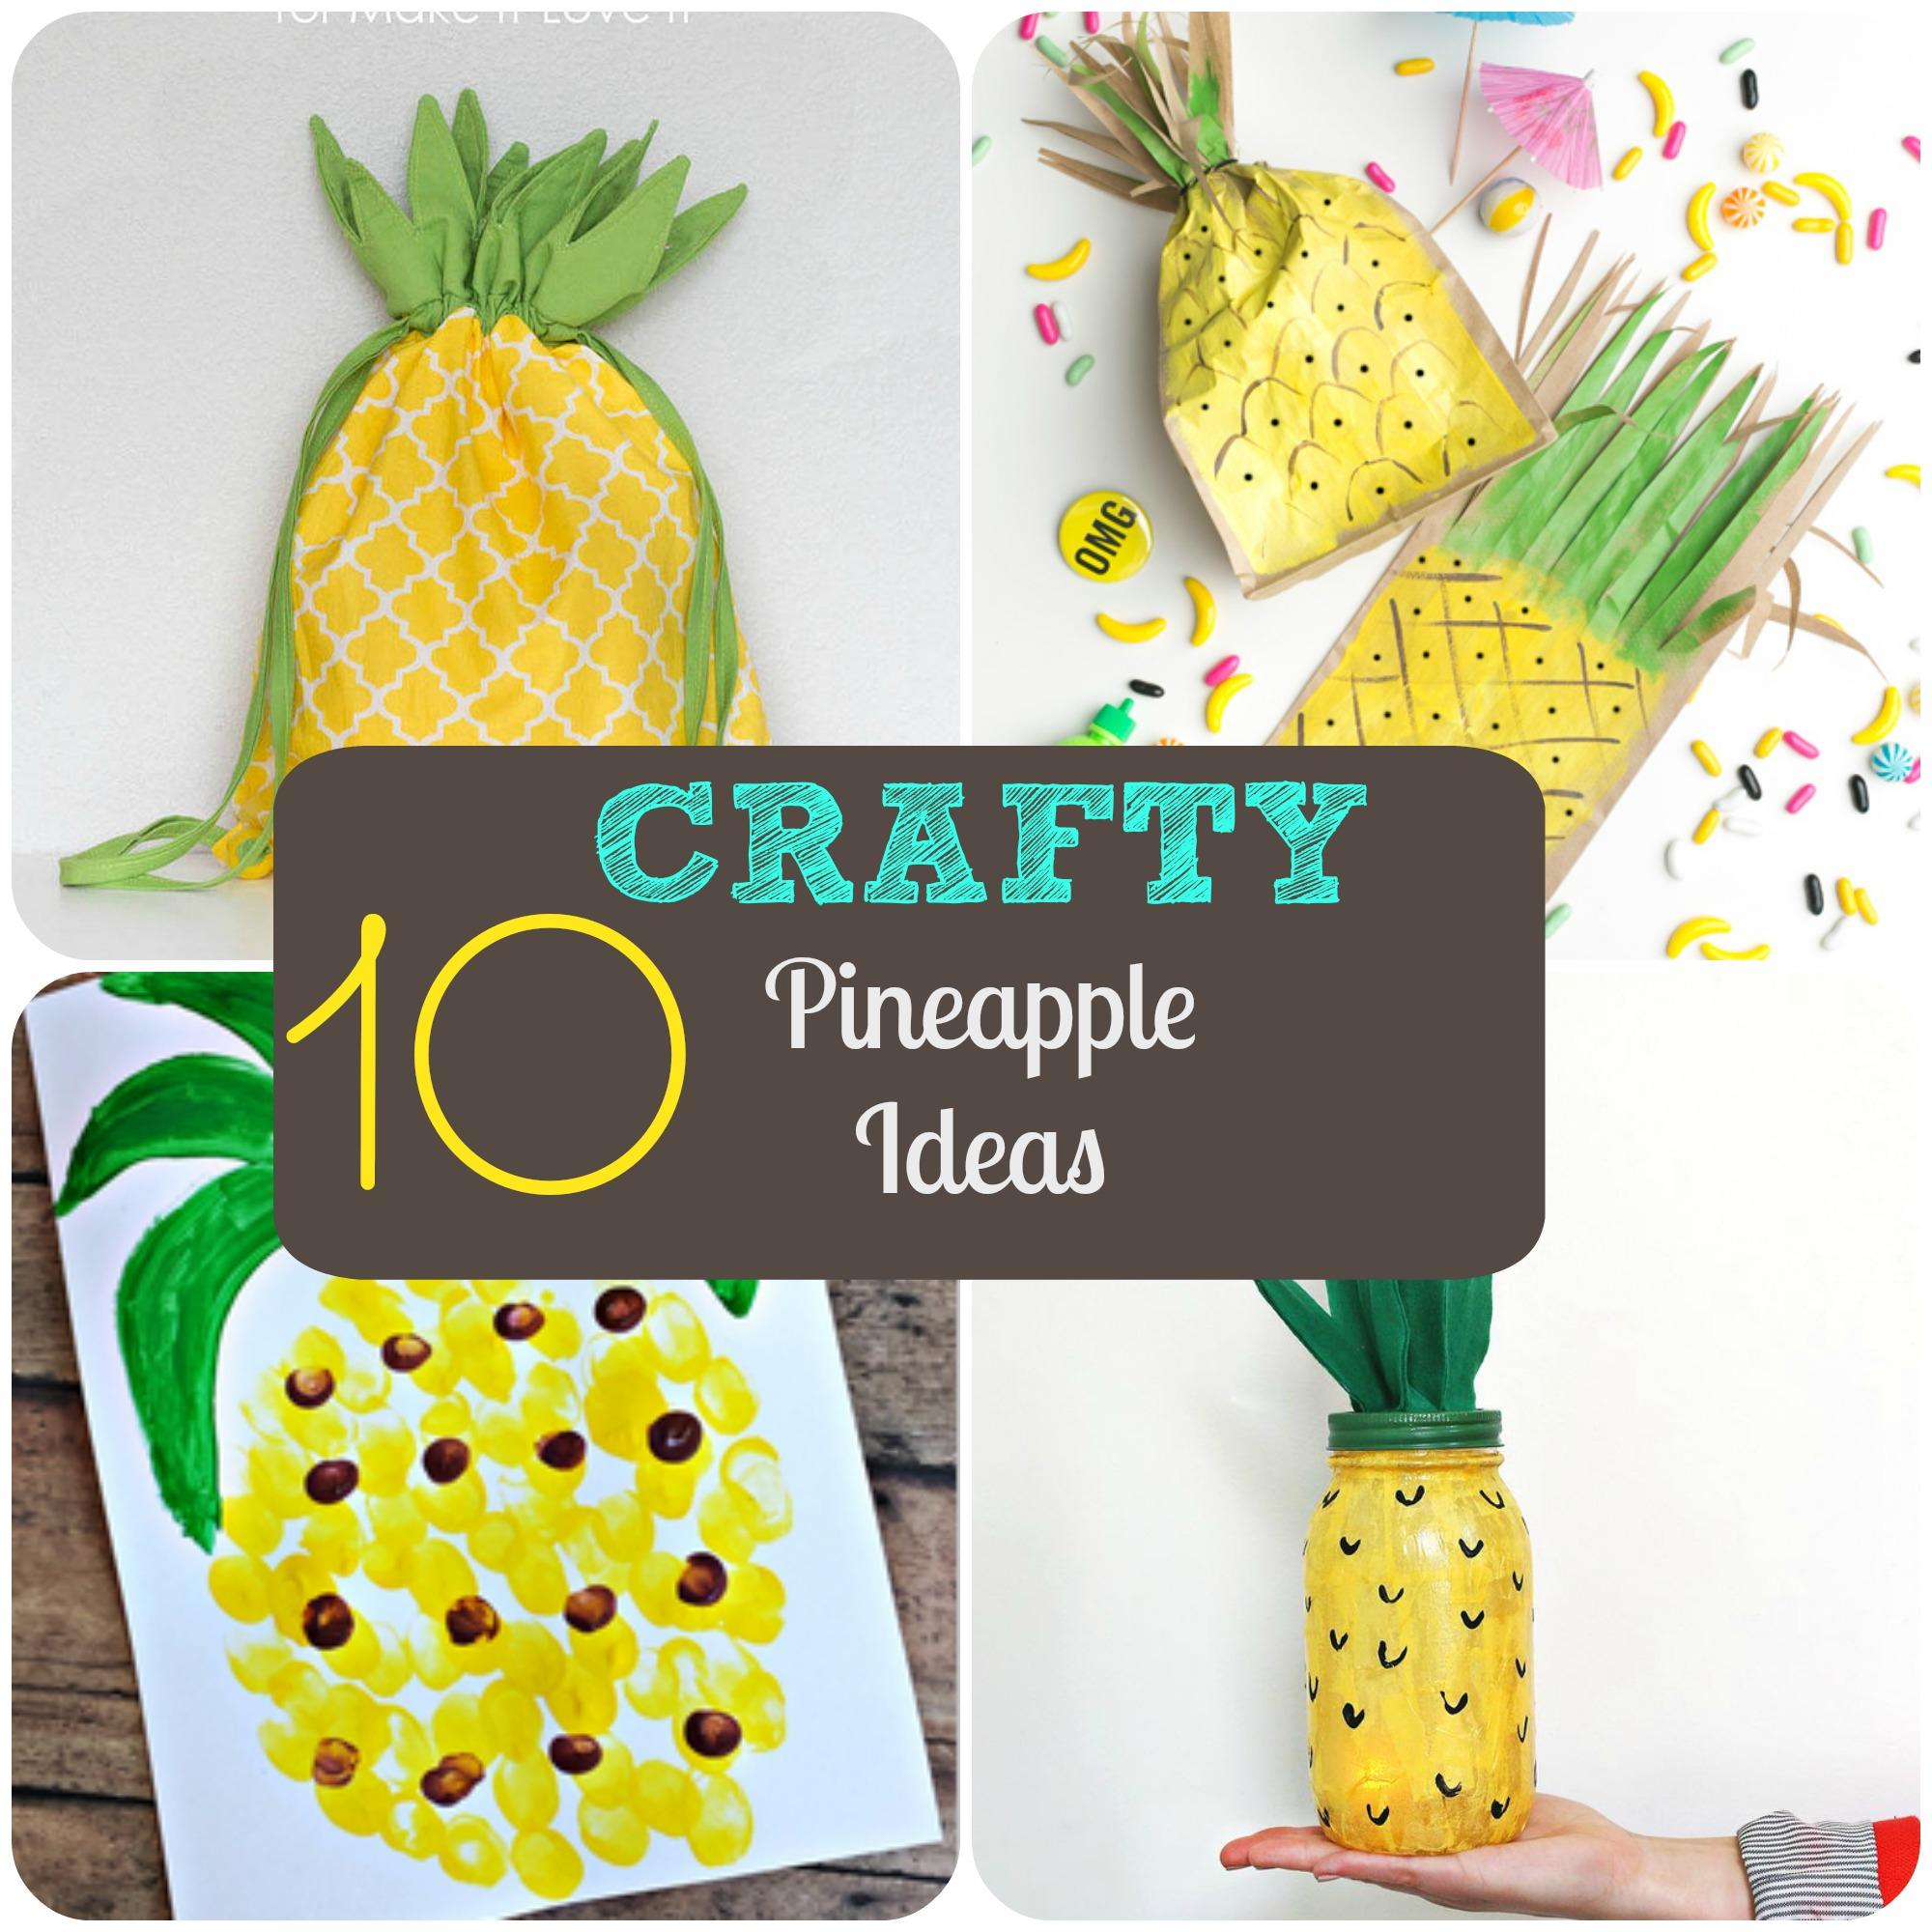 10 crafty pineapple ideas